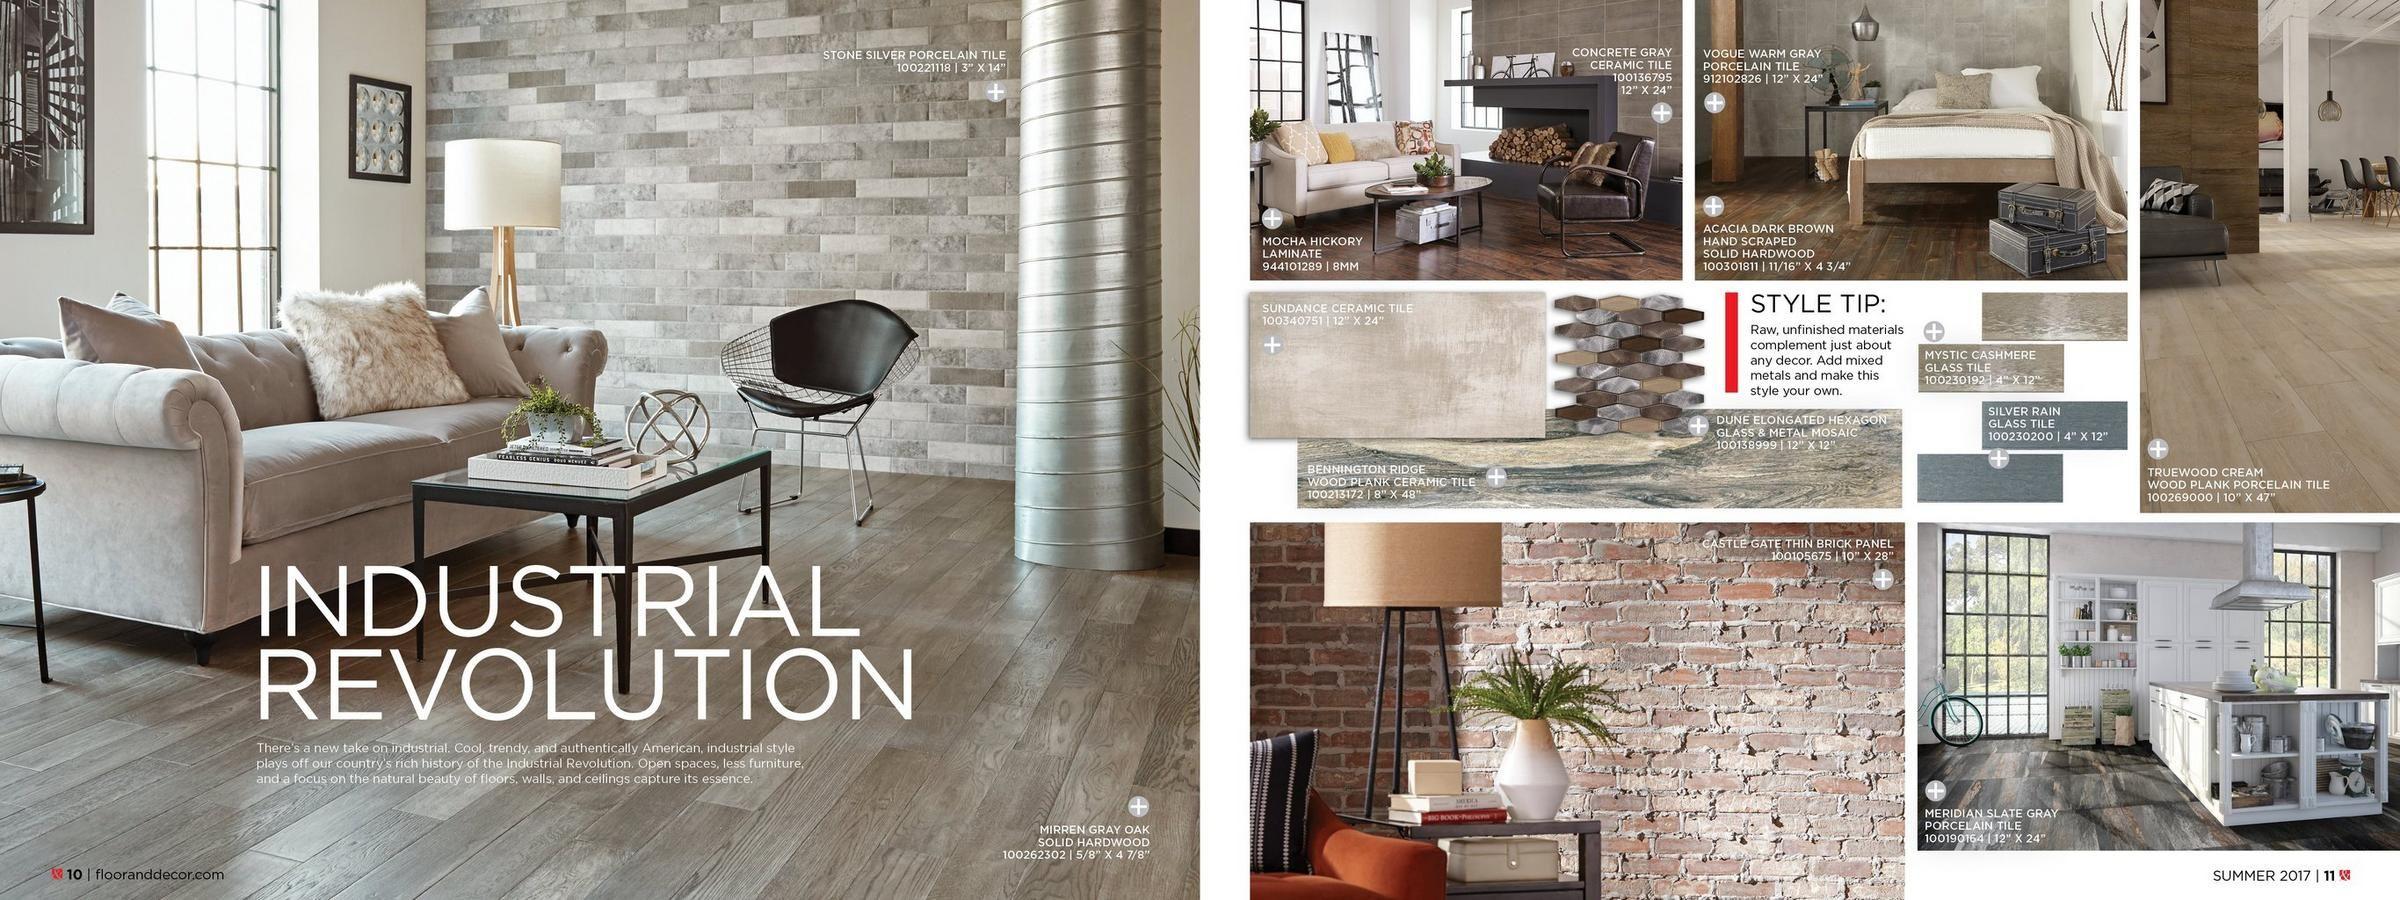 Floor And Decor Subway Tile Cool 2017 Summer Catalog  Floor & Decor  Design  Pinterest  Floor Review